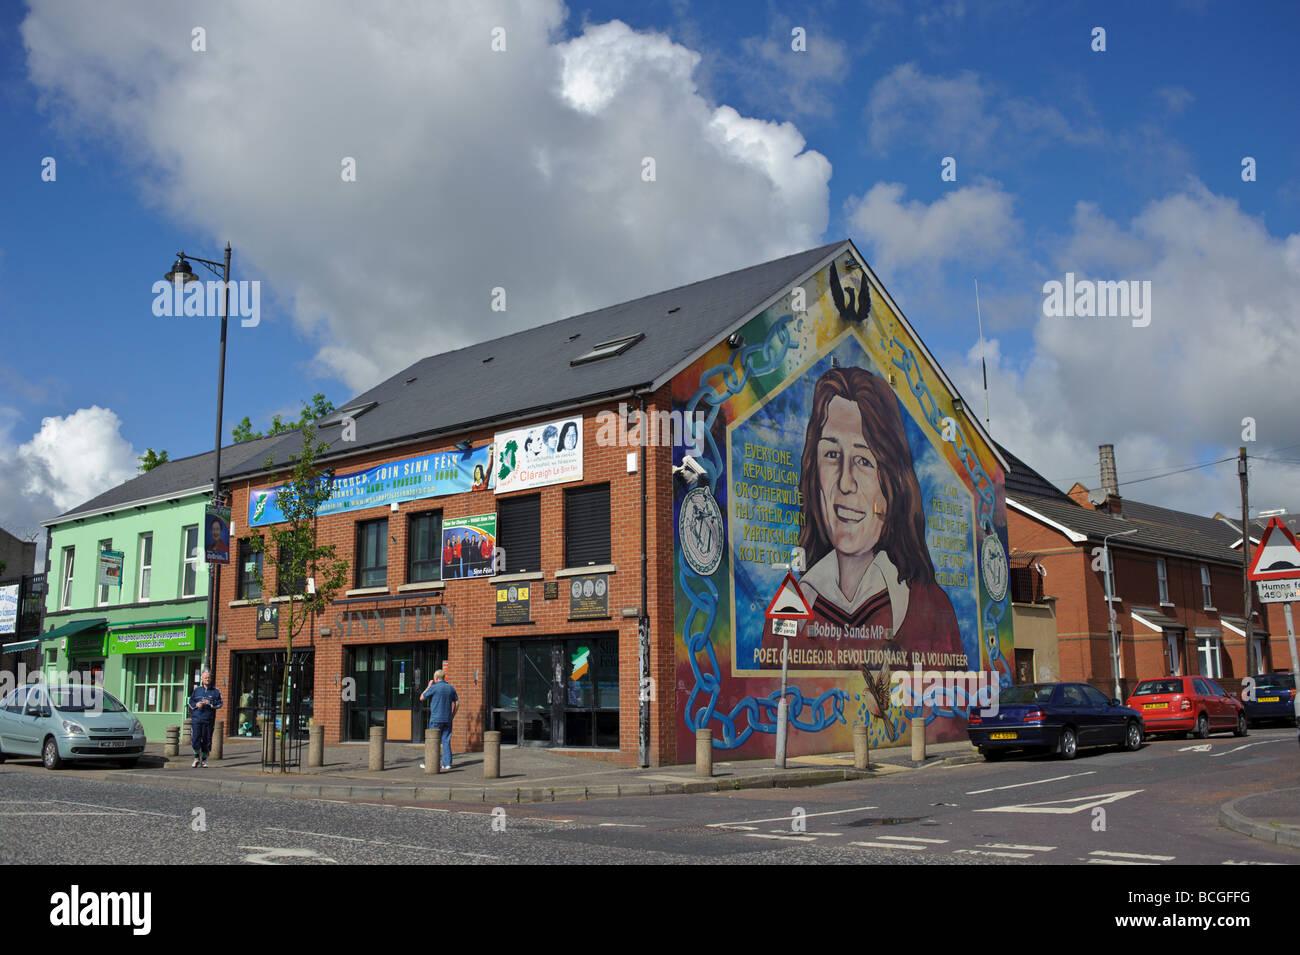 Sinn Fein headquareters in Belfast - Stock Image